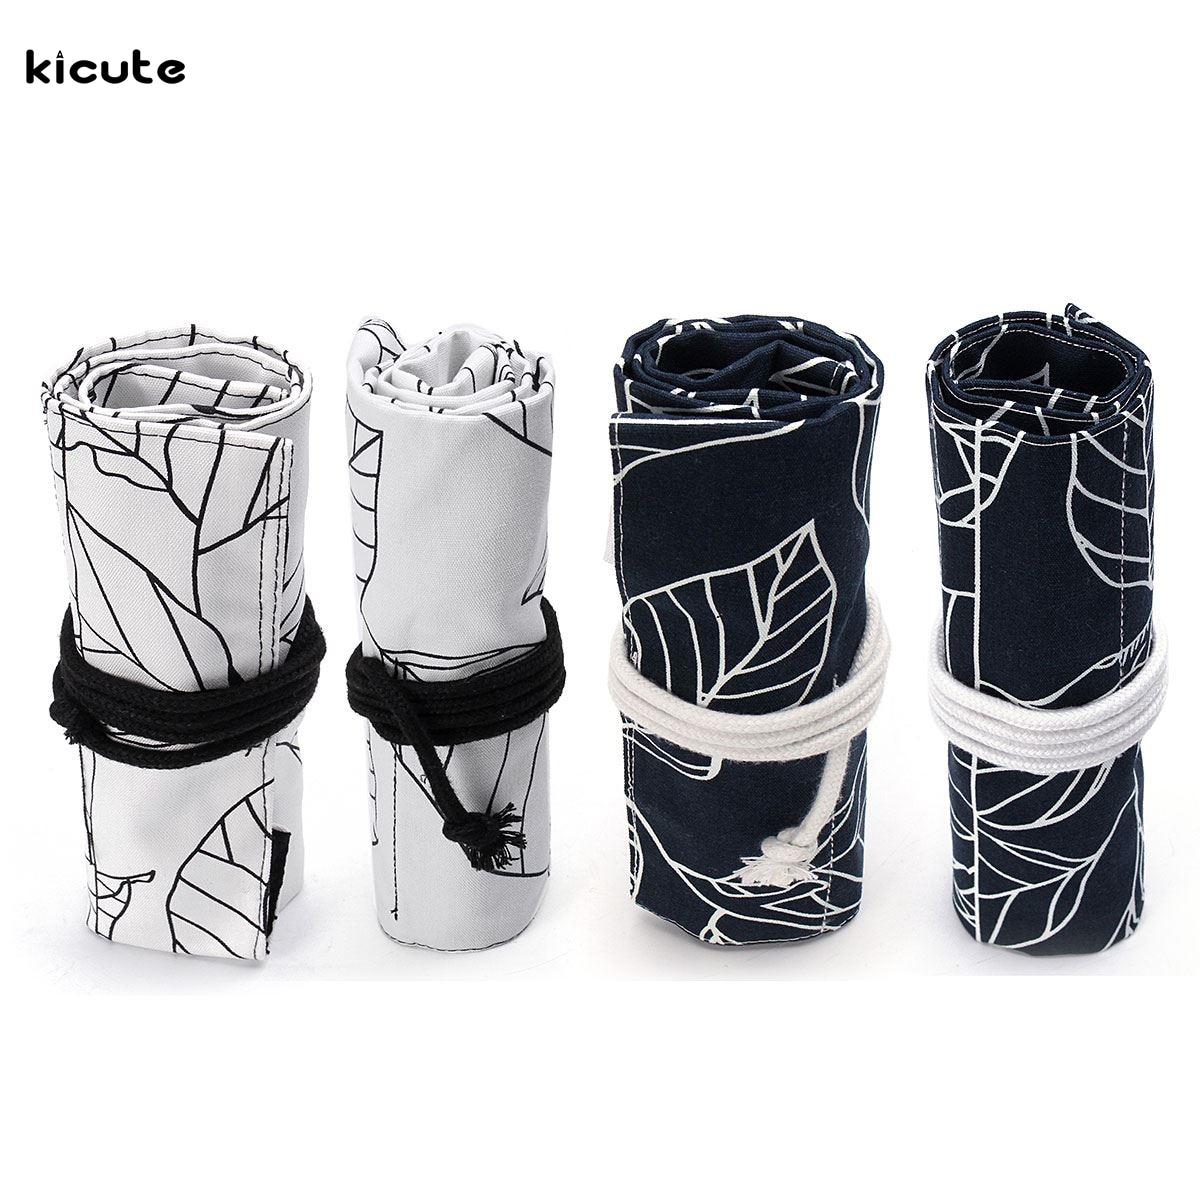 36/48 Holes Black White Leaves Canvas Roll Up Pencil Case Pen Brush Bag Holder Storage Pouch School Supplies цена